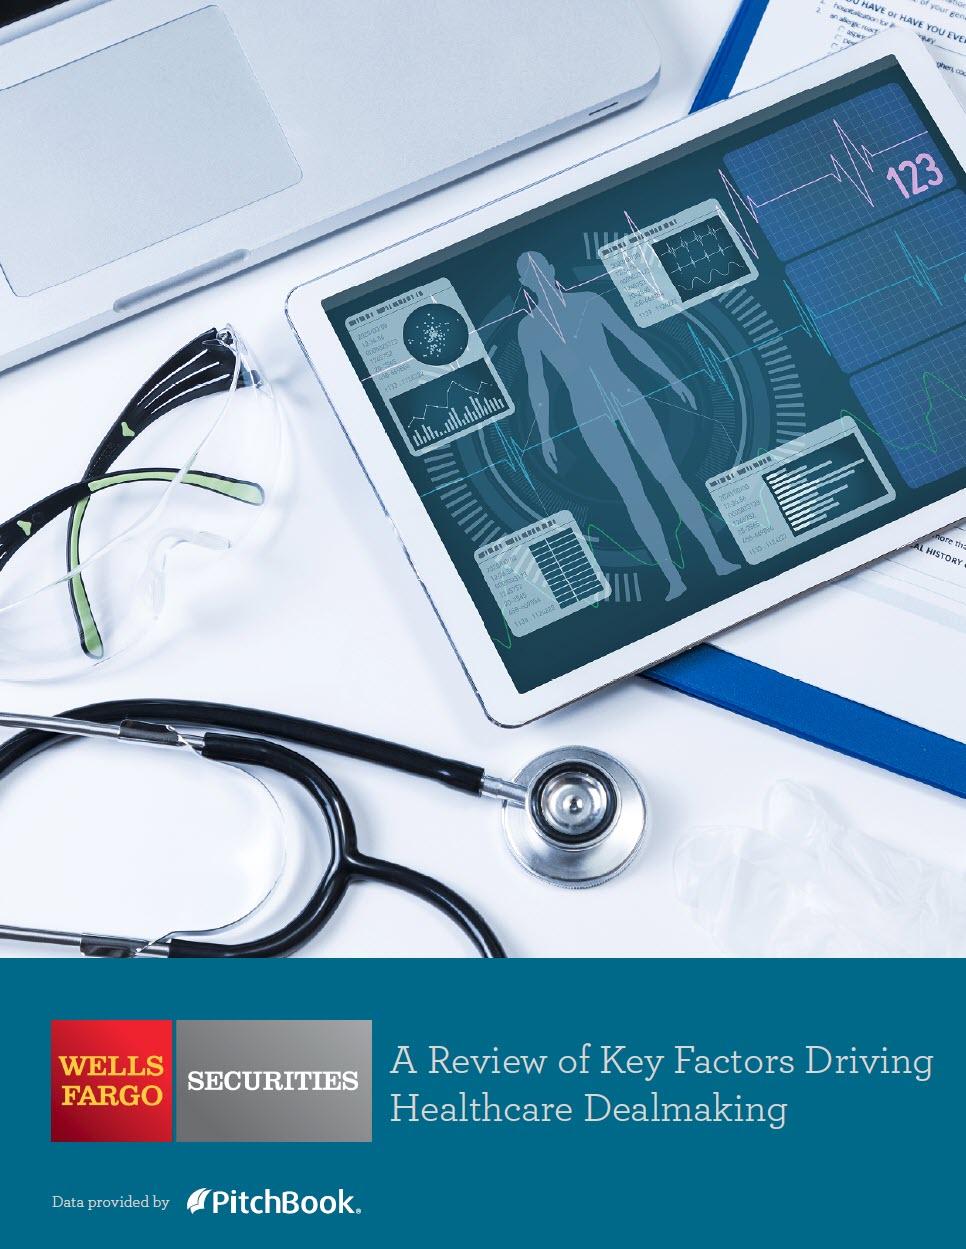 Wells Fargo: A review of key factors driving healthcare dealmaking